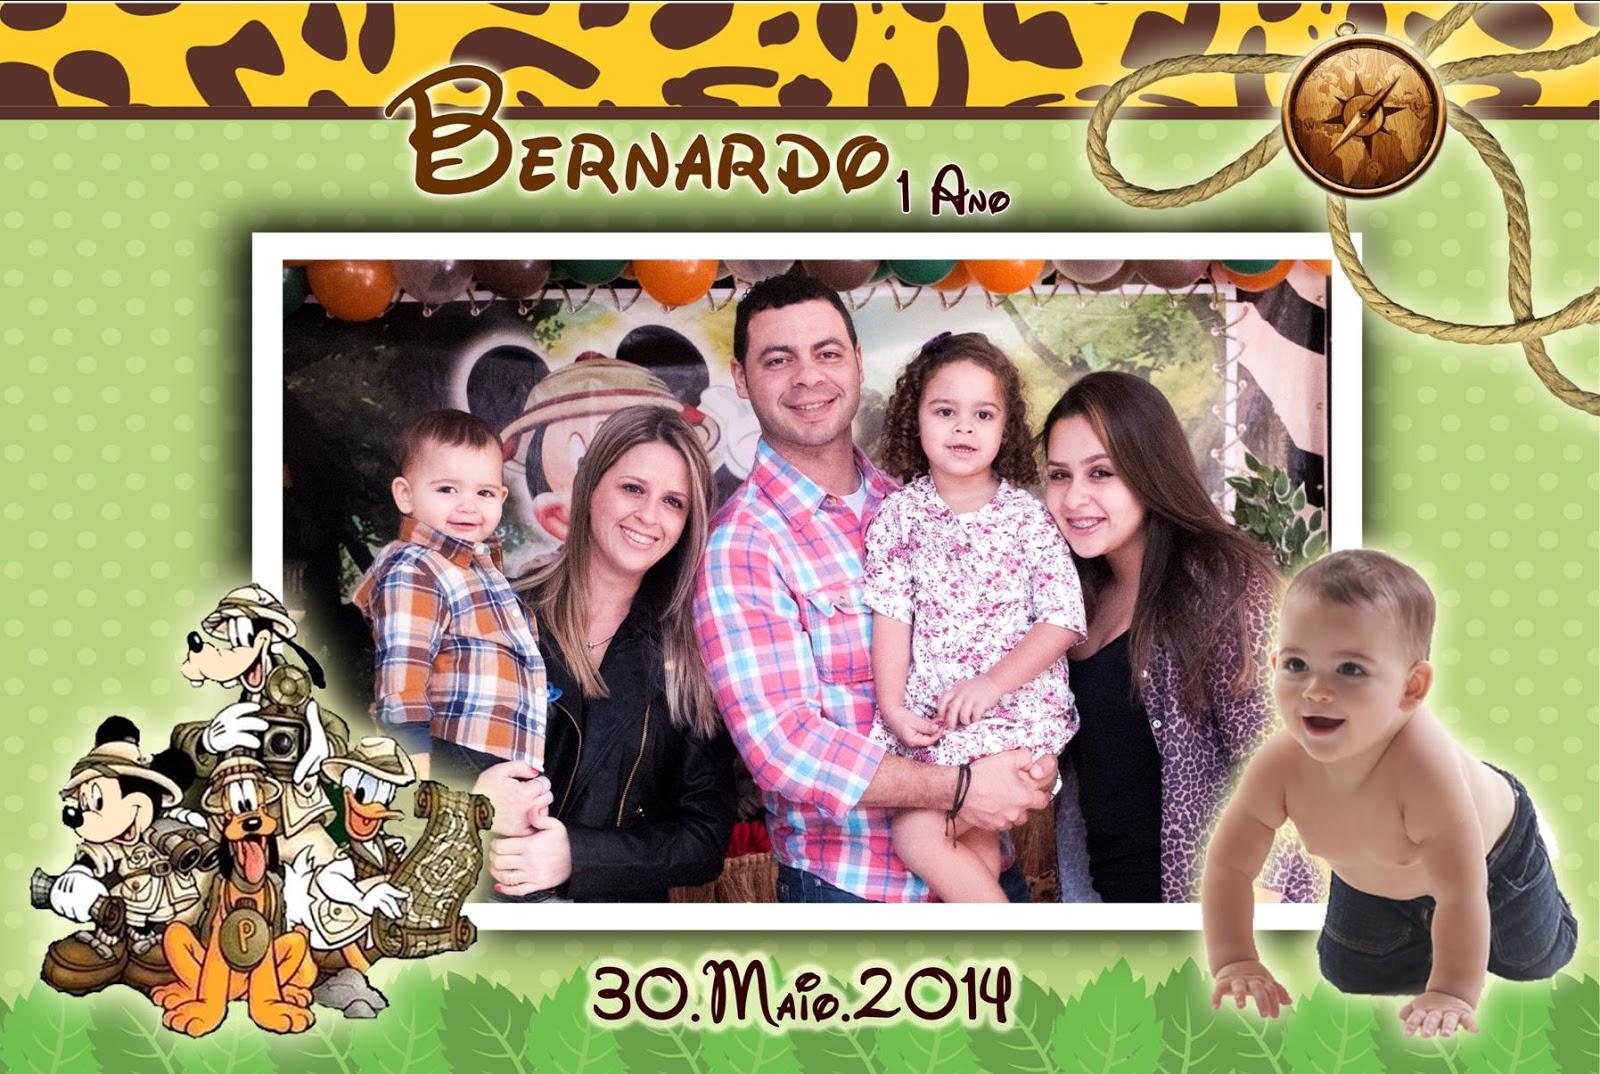 http://fotos-lembranca.blogspot.com.br/2014/06/20140601-bernardo-1-ano-mickey-safari.html